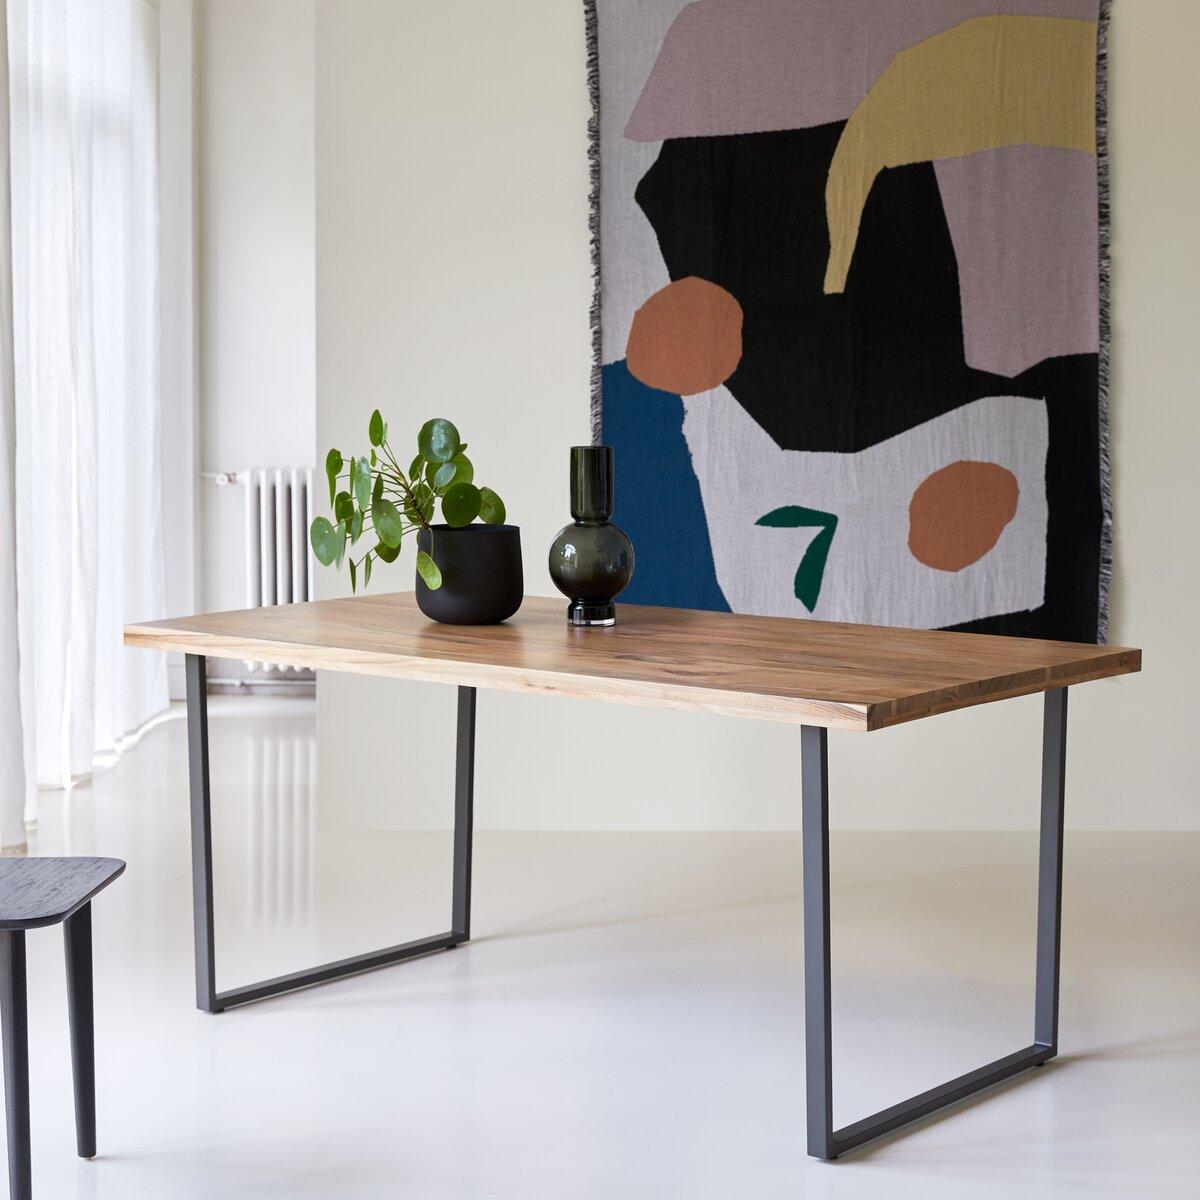 Table en métal et bois d'acacia massif 175x90